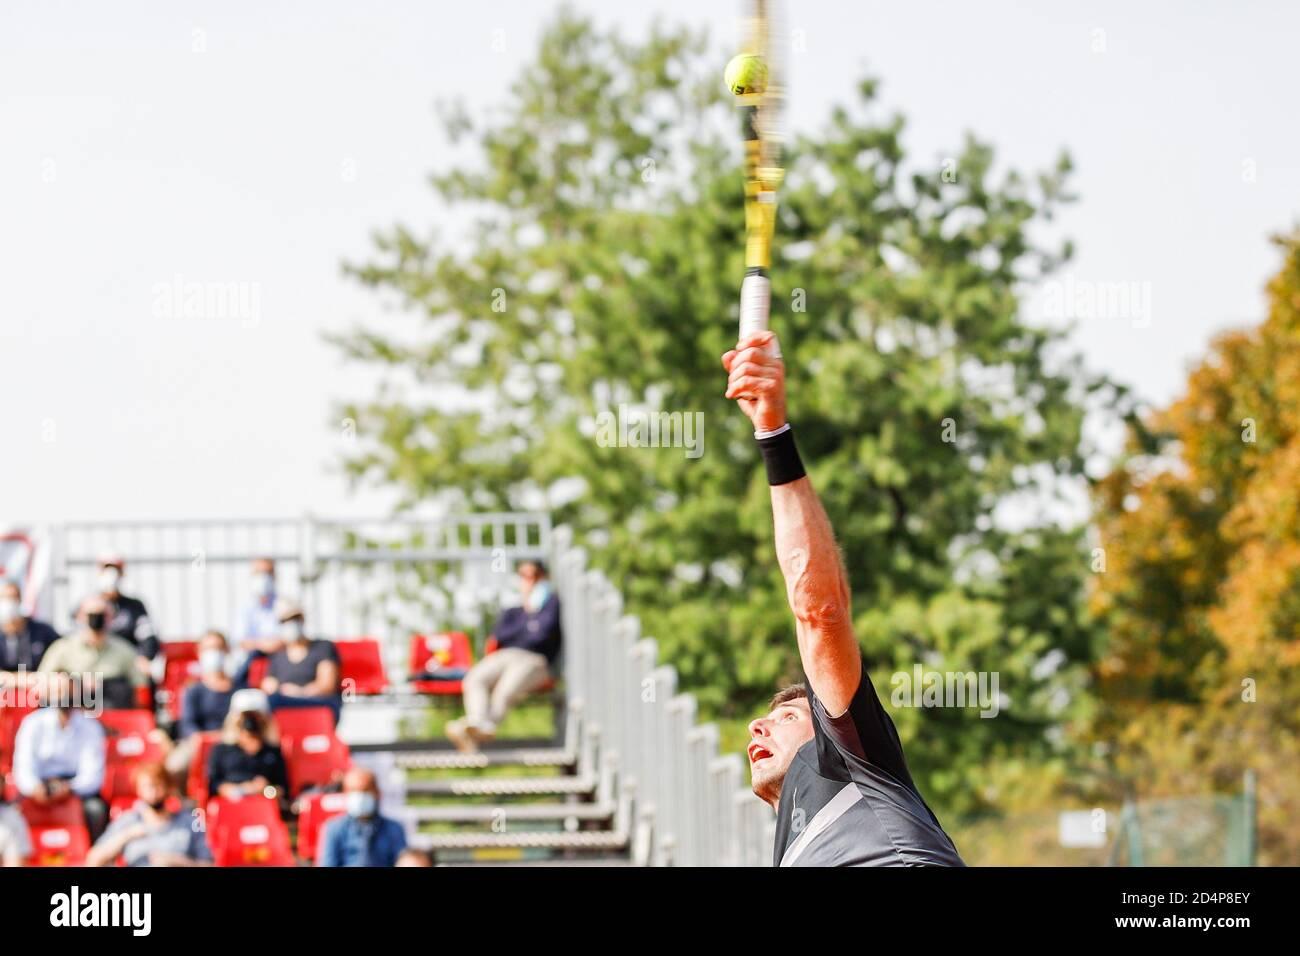 Ederico Delbonis durante ATP Challenger 125 - Internazionali Emilia Romagna, Tennis Internationals, parma, Italia, 09 Oct 2020 crédito: LM/Roberta Corrad Foto de stock